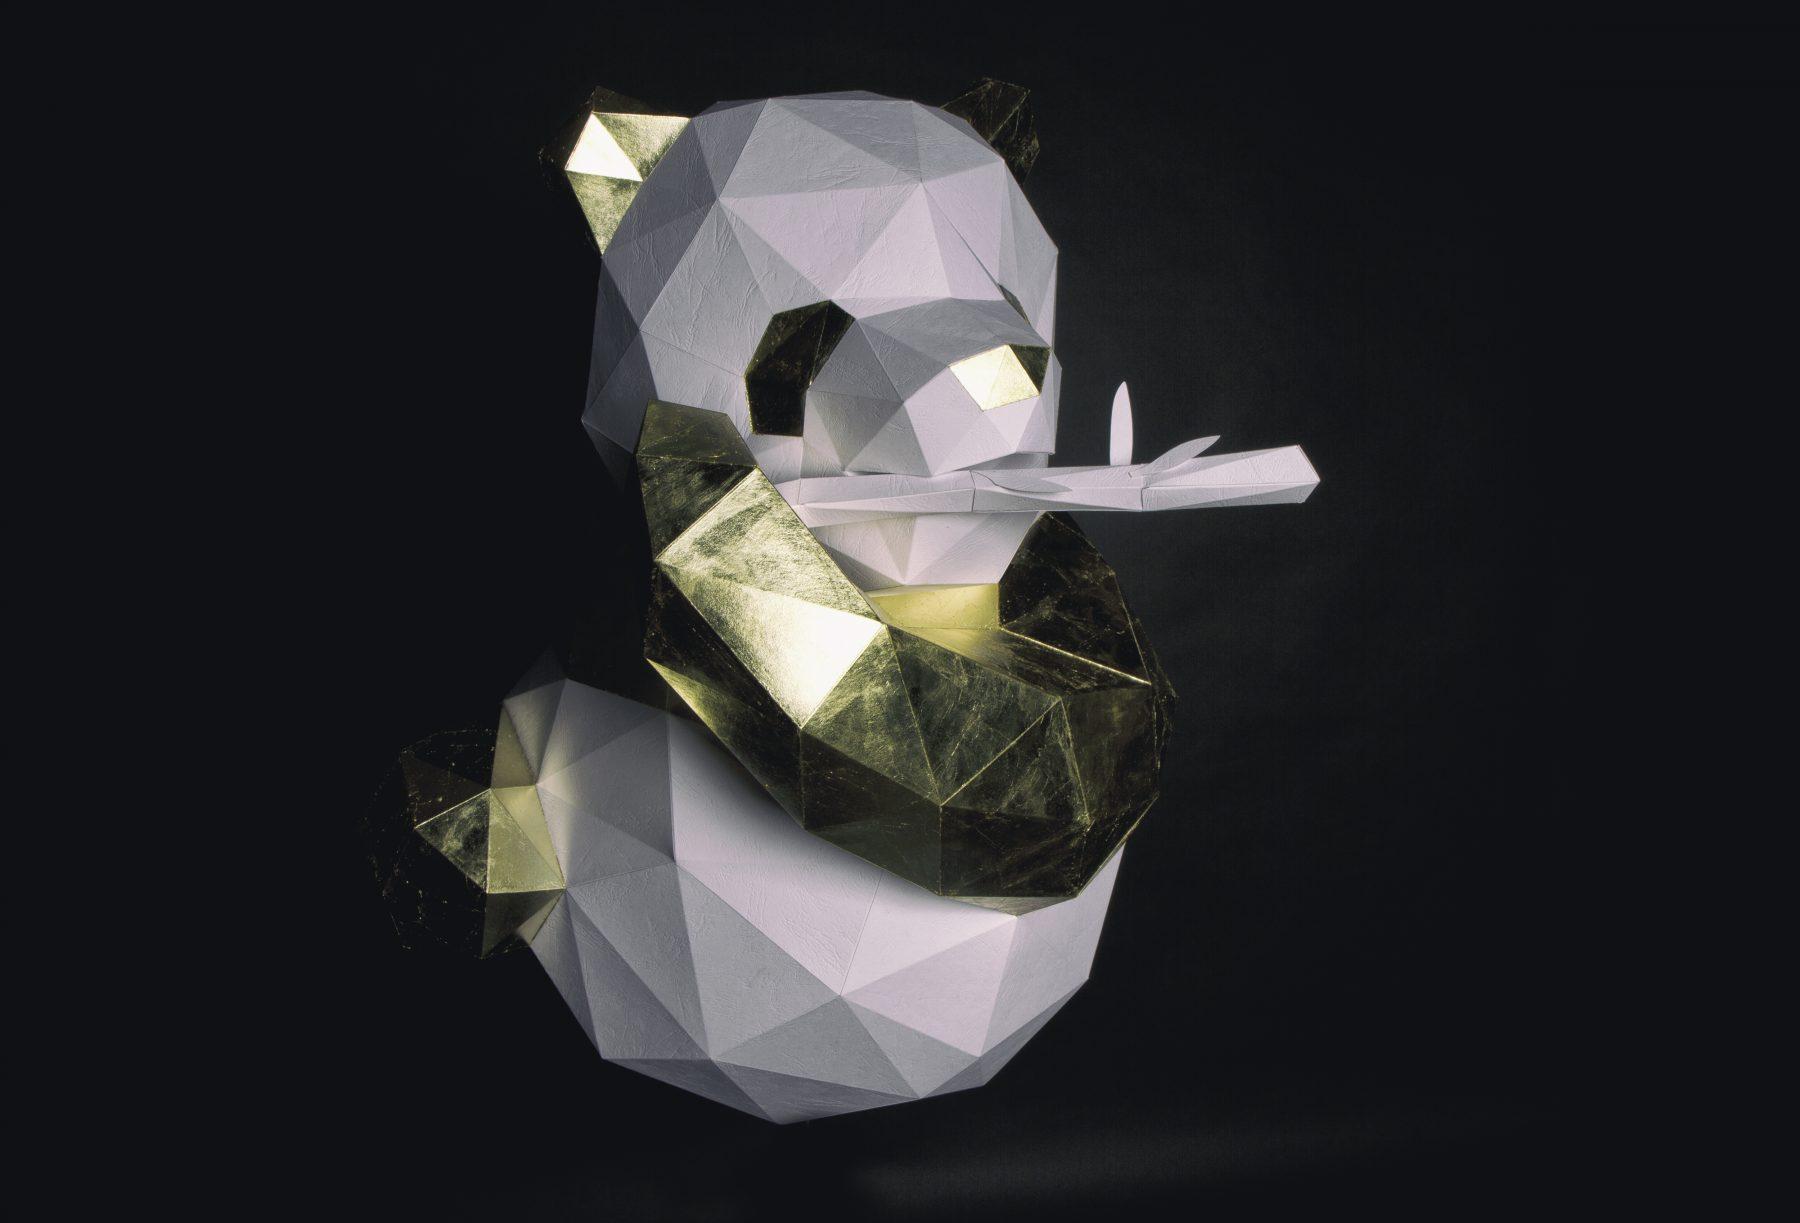 Paper Papier Chengdu Panda Origami Gold Leaf Dorure low poly